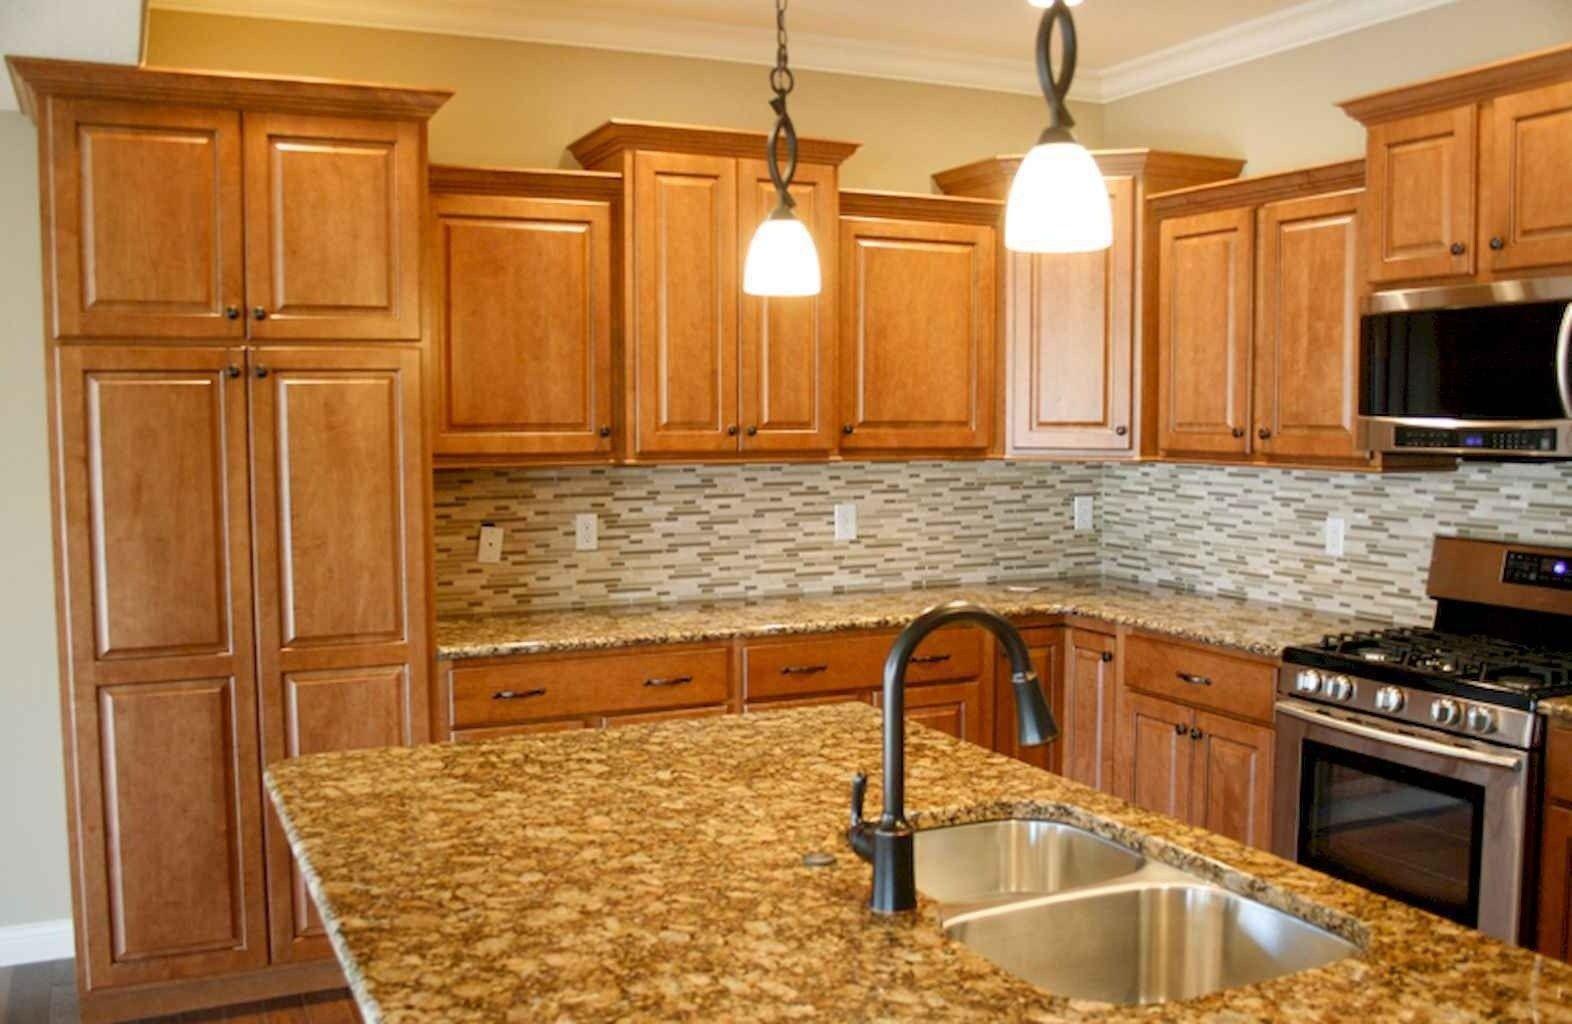 100 supreme oak kitchen cabinets ideas decoration for farmhouse style maple kitchen cabinets on farmhouse kitchen maple cabinets id=89400